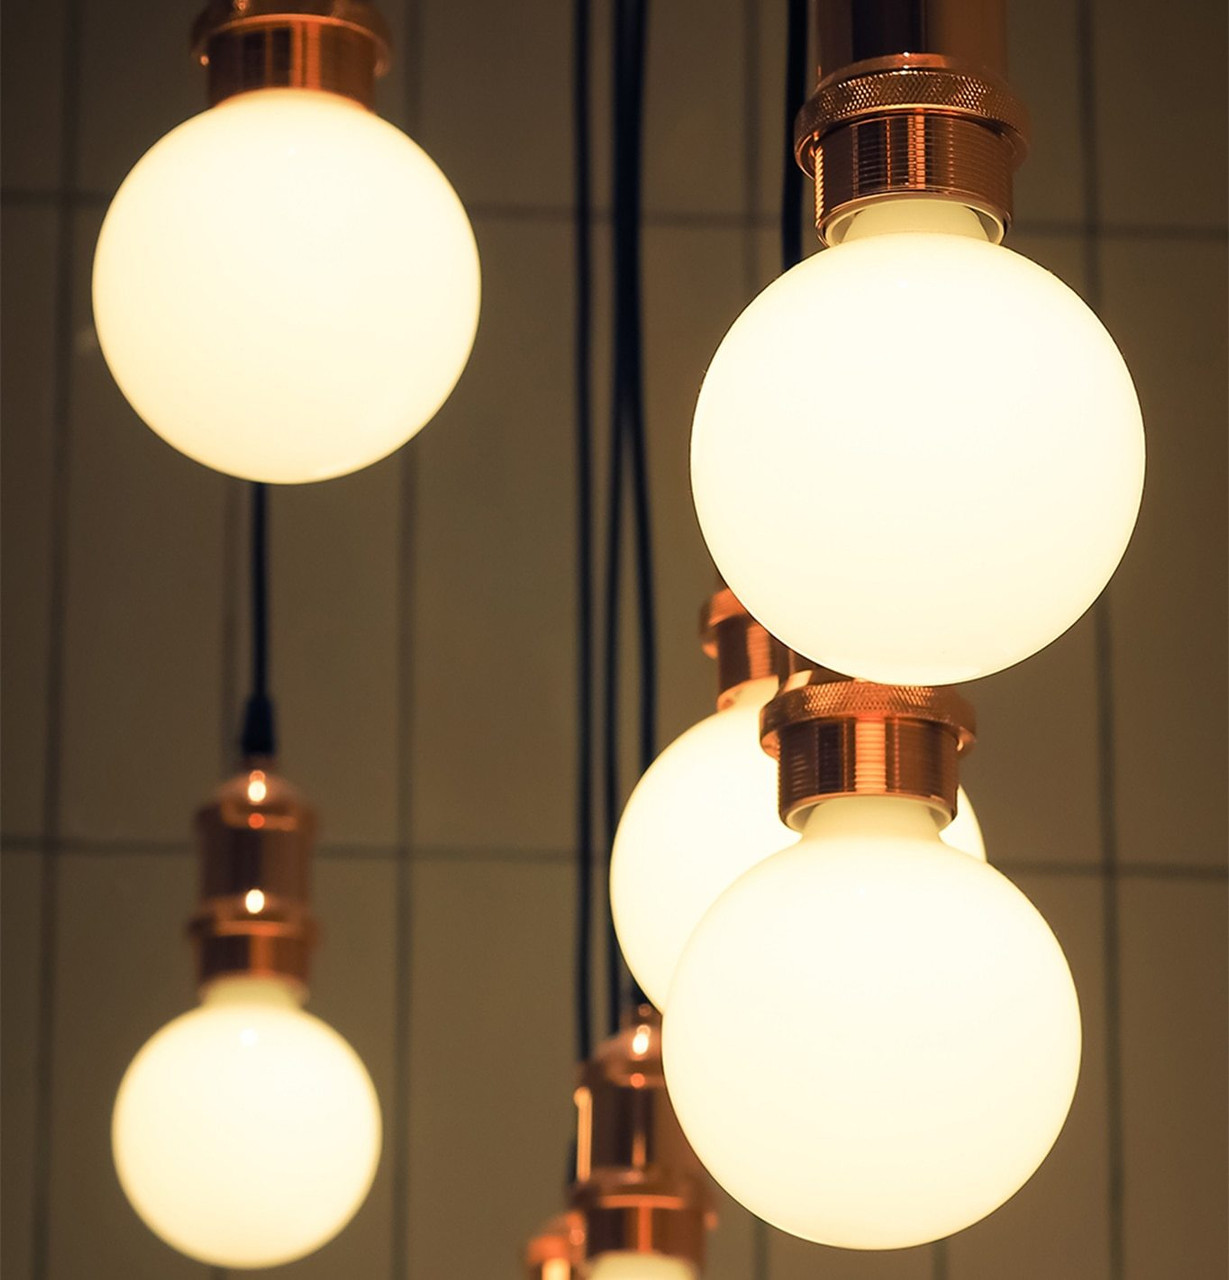 Crompton Lamps LED Globe 7W Light Bulbs